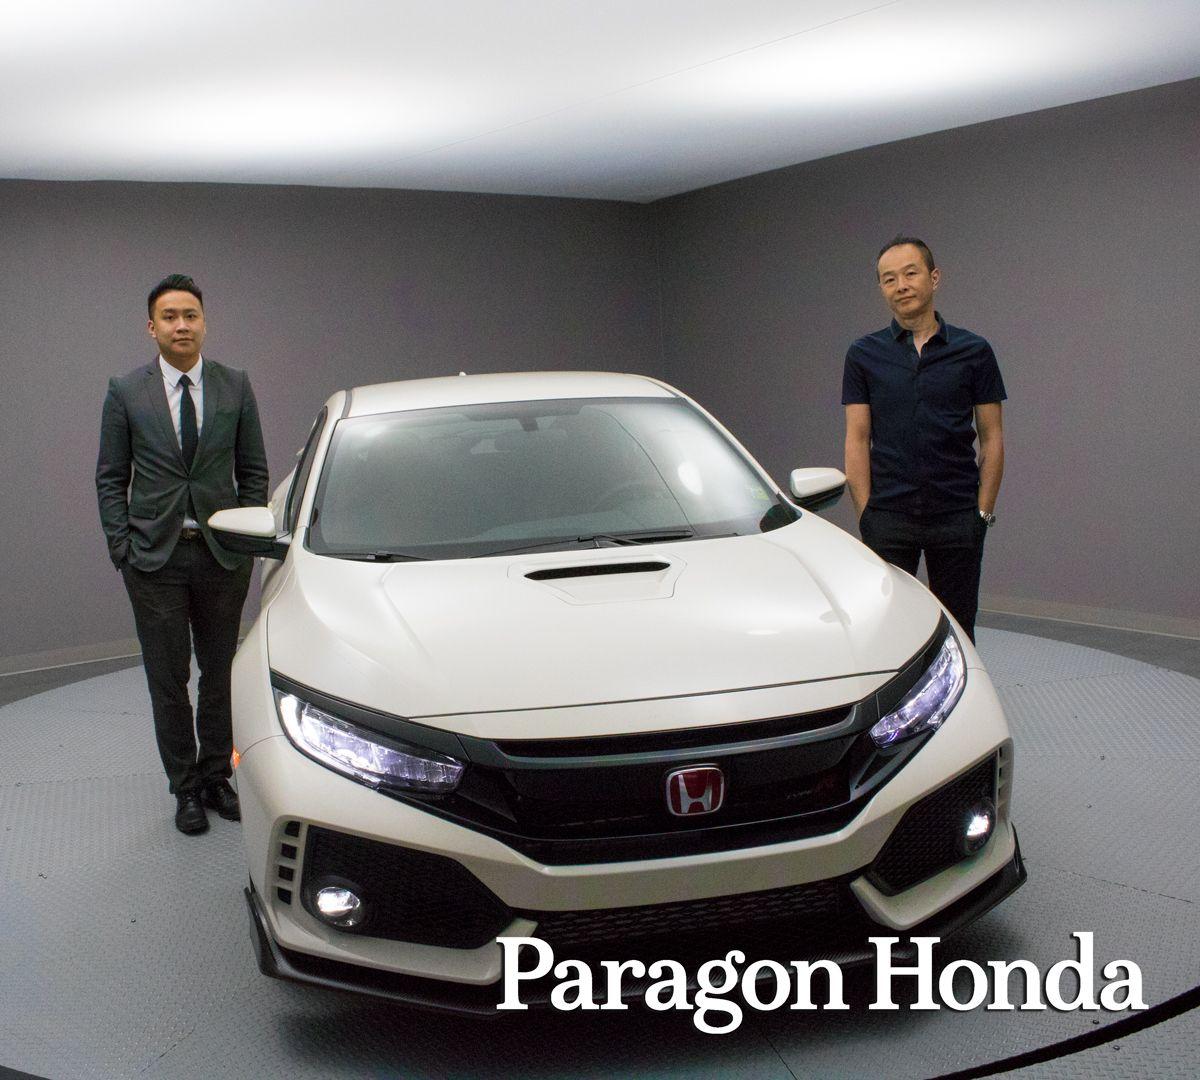 Awesome Paragon Honda: New Honda And Used Car Dealer In Woodside, NY